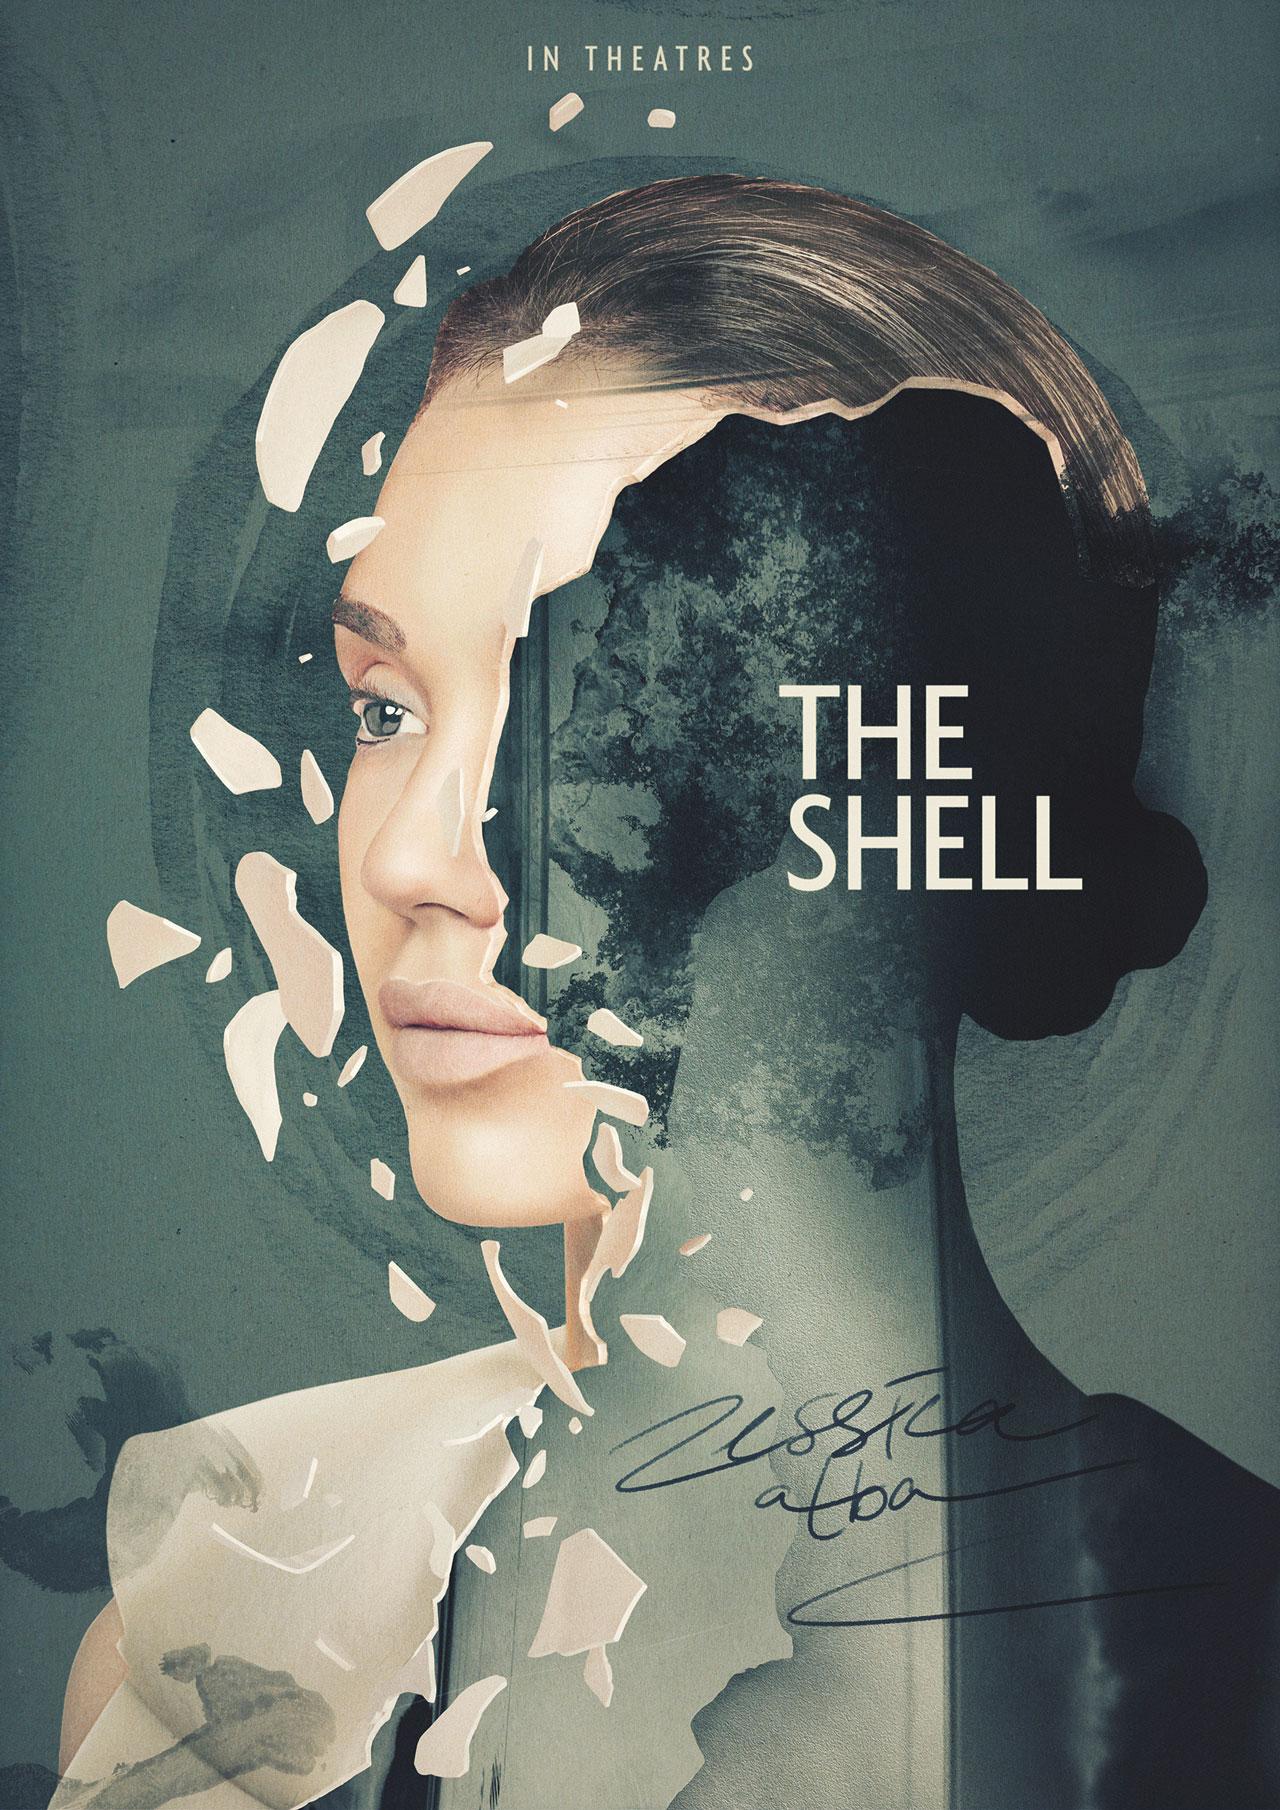 theshell_01